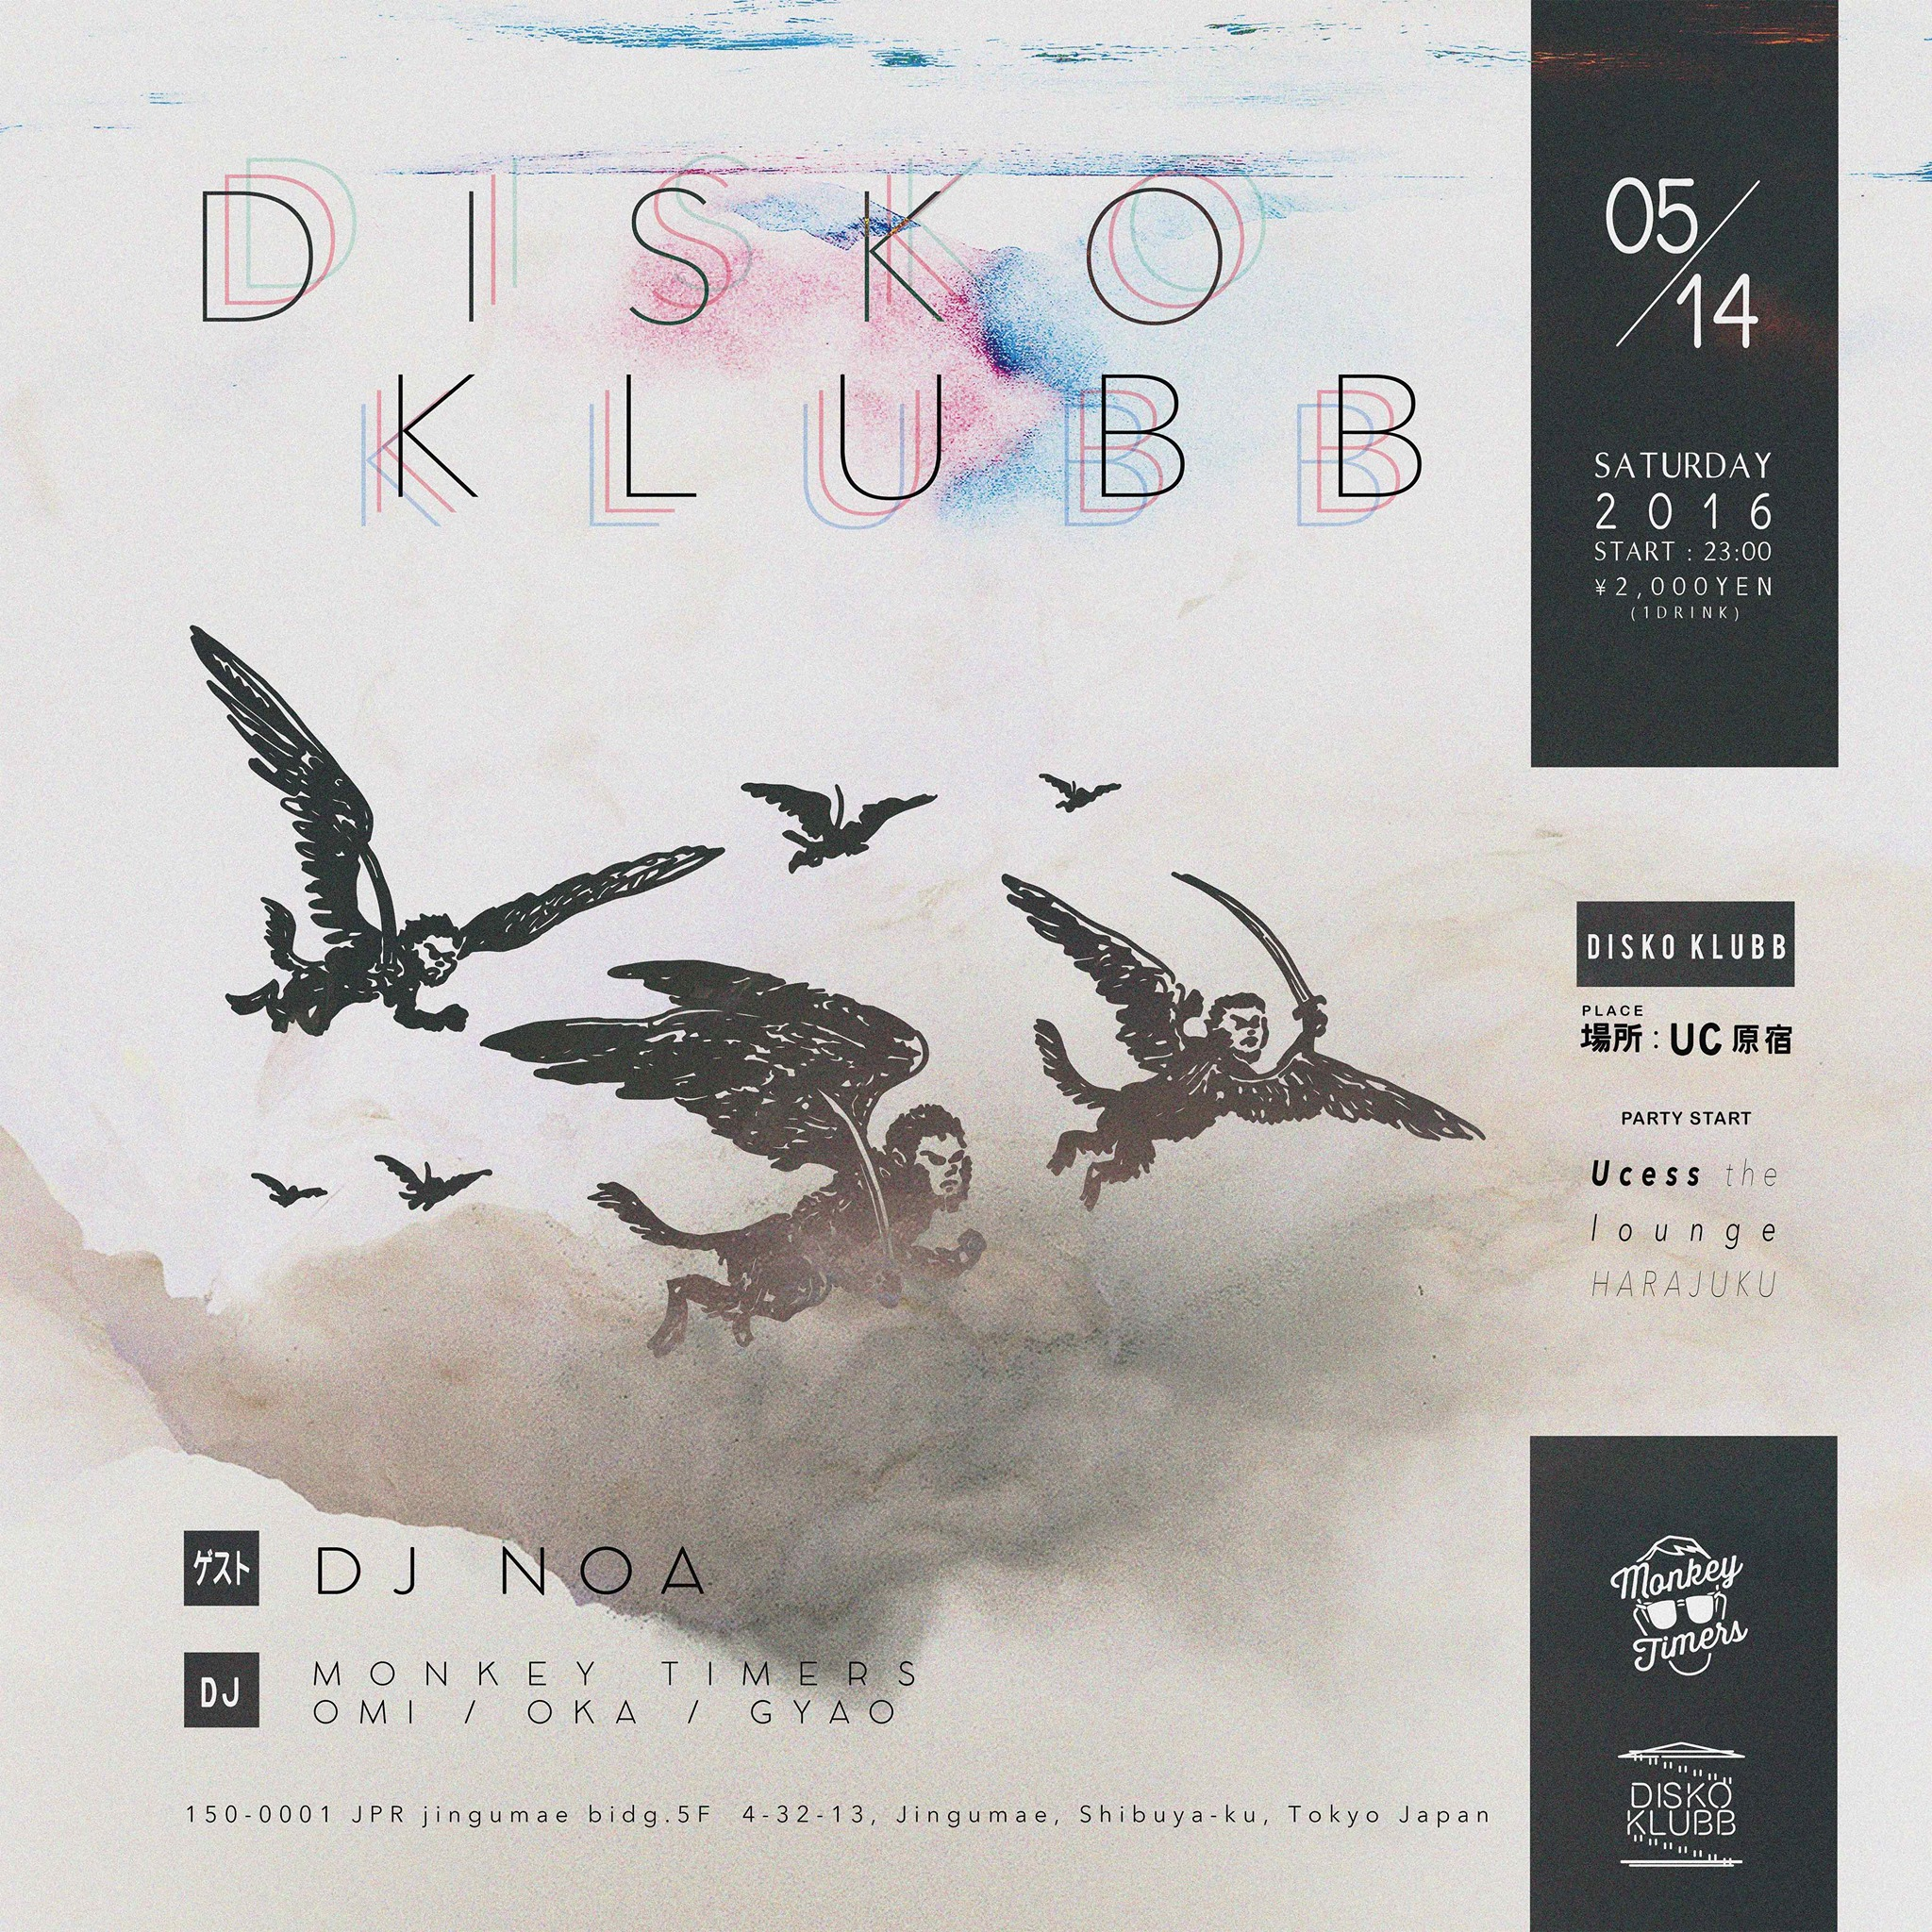 DISKO KLUBB ft DJ NOA